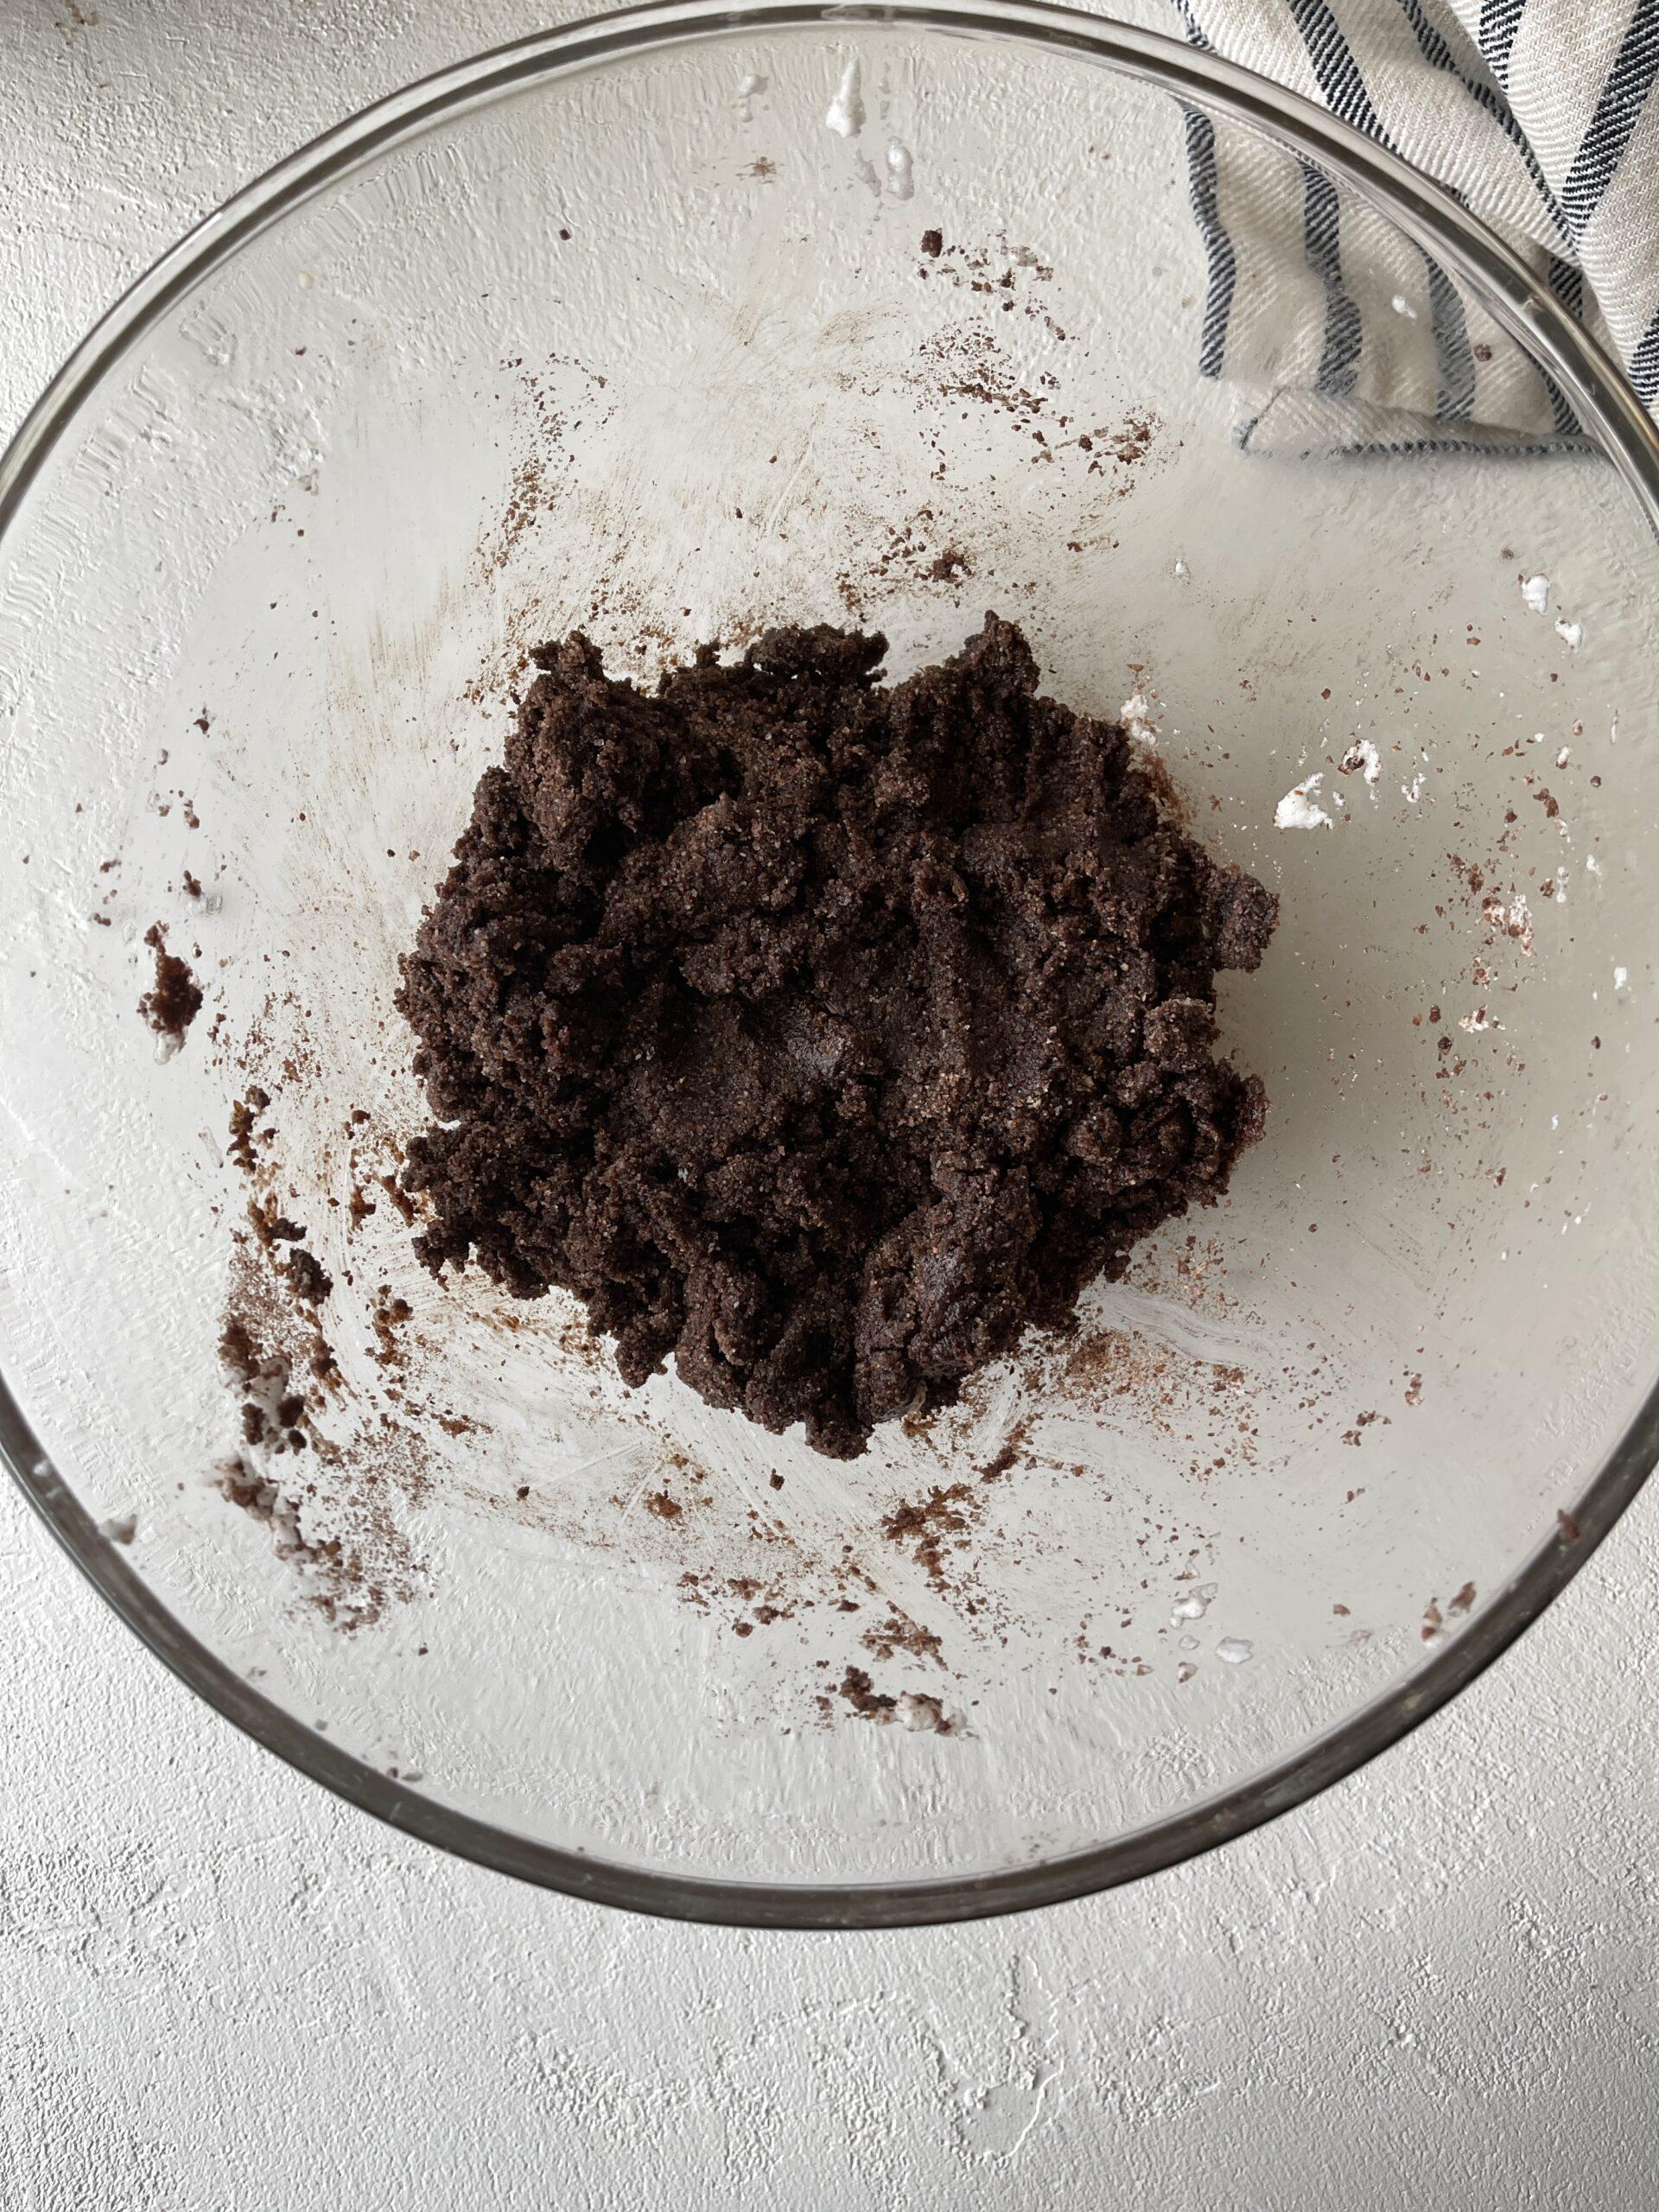 Almond flour mixed with egg whites and dutch cacao powder